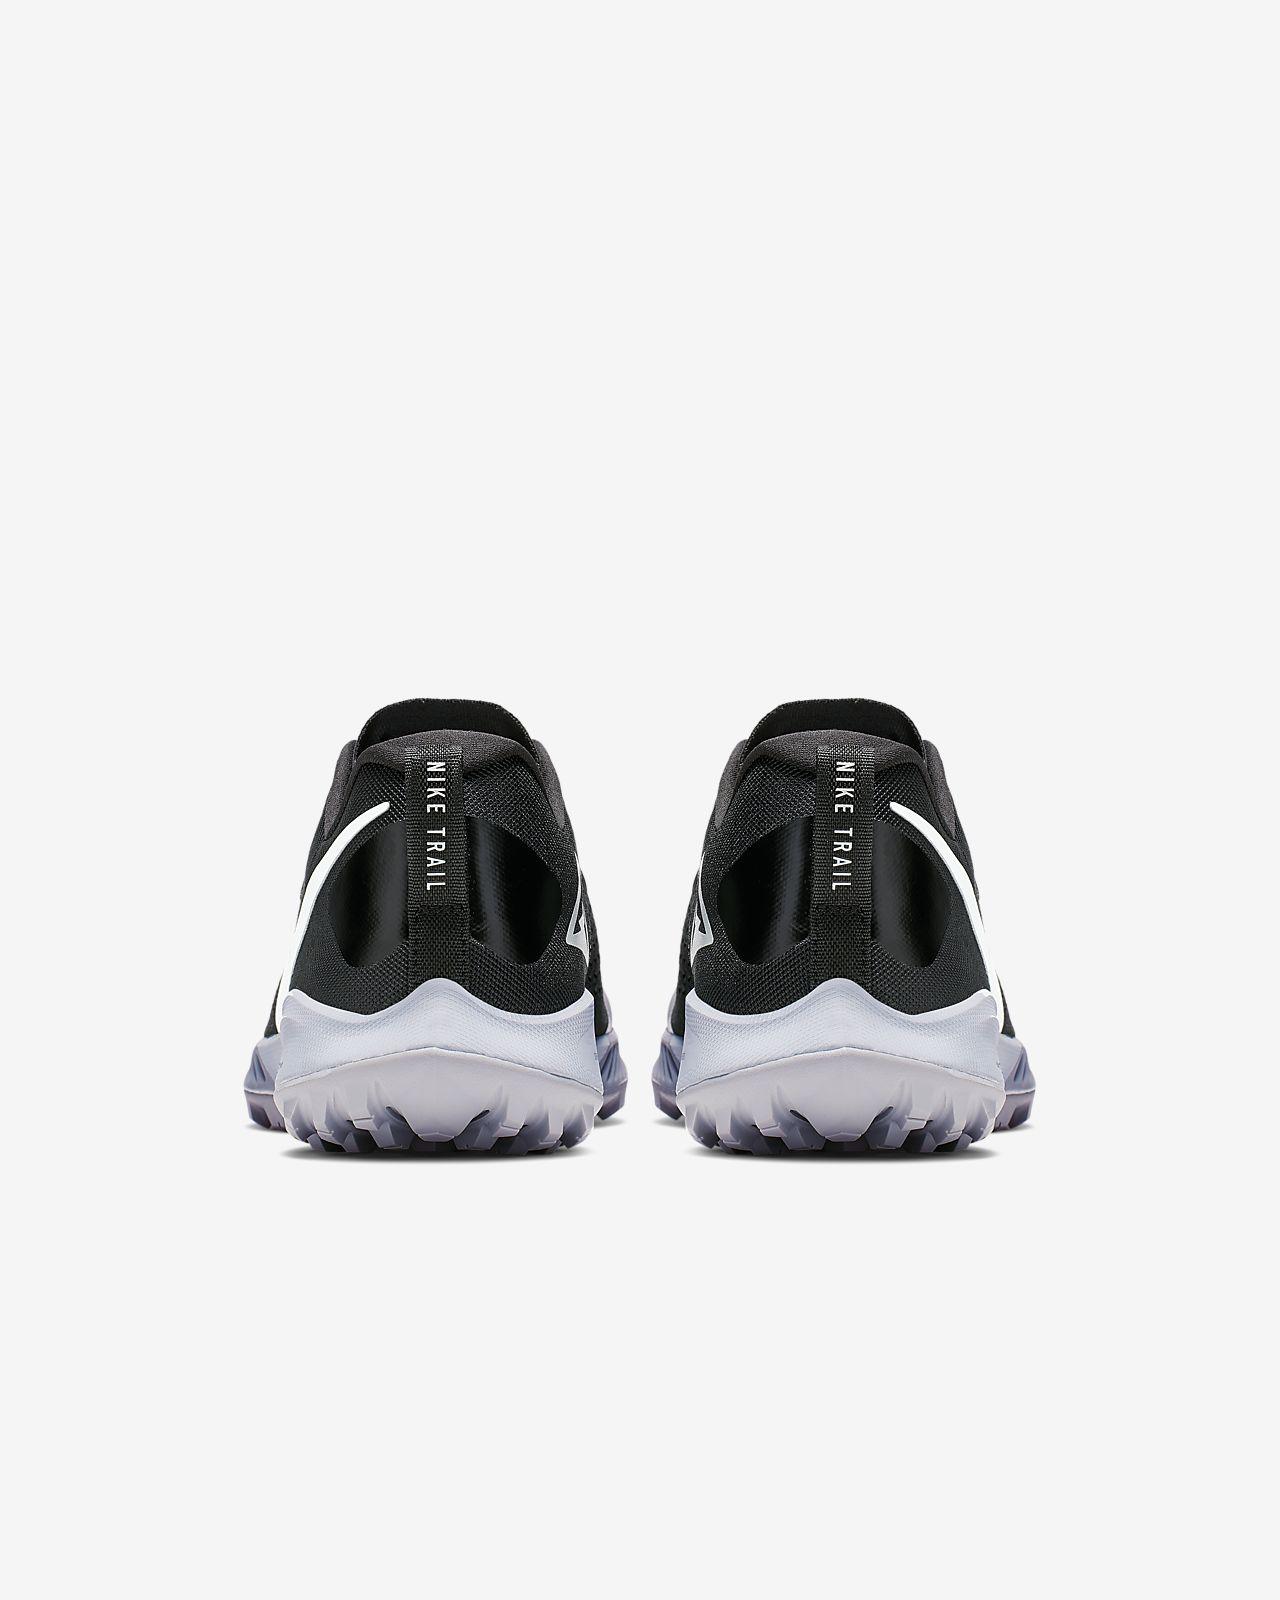 refined mens Nike Air Pegasus 33 Black Running Shoes